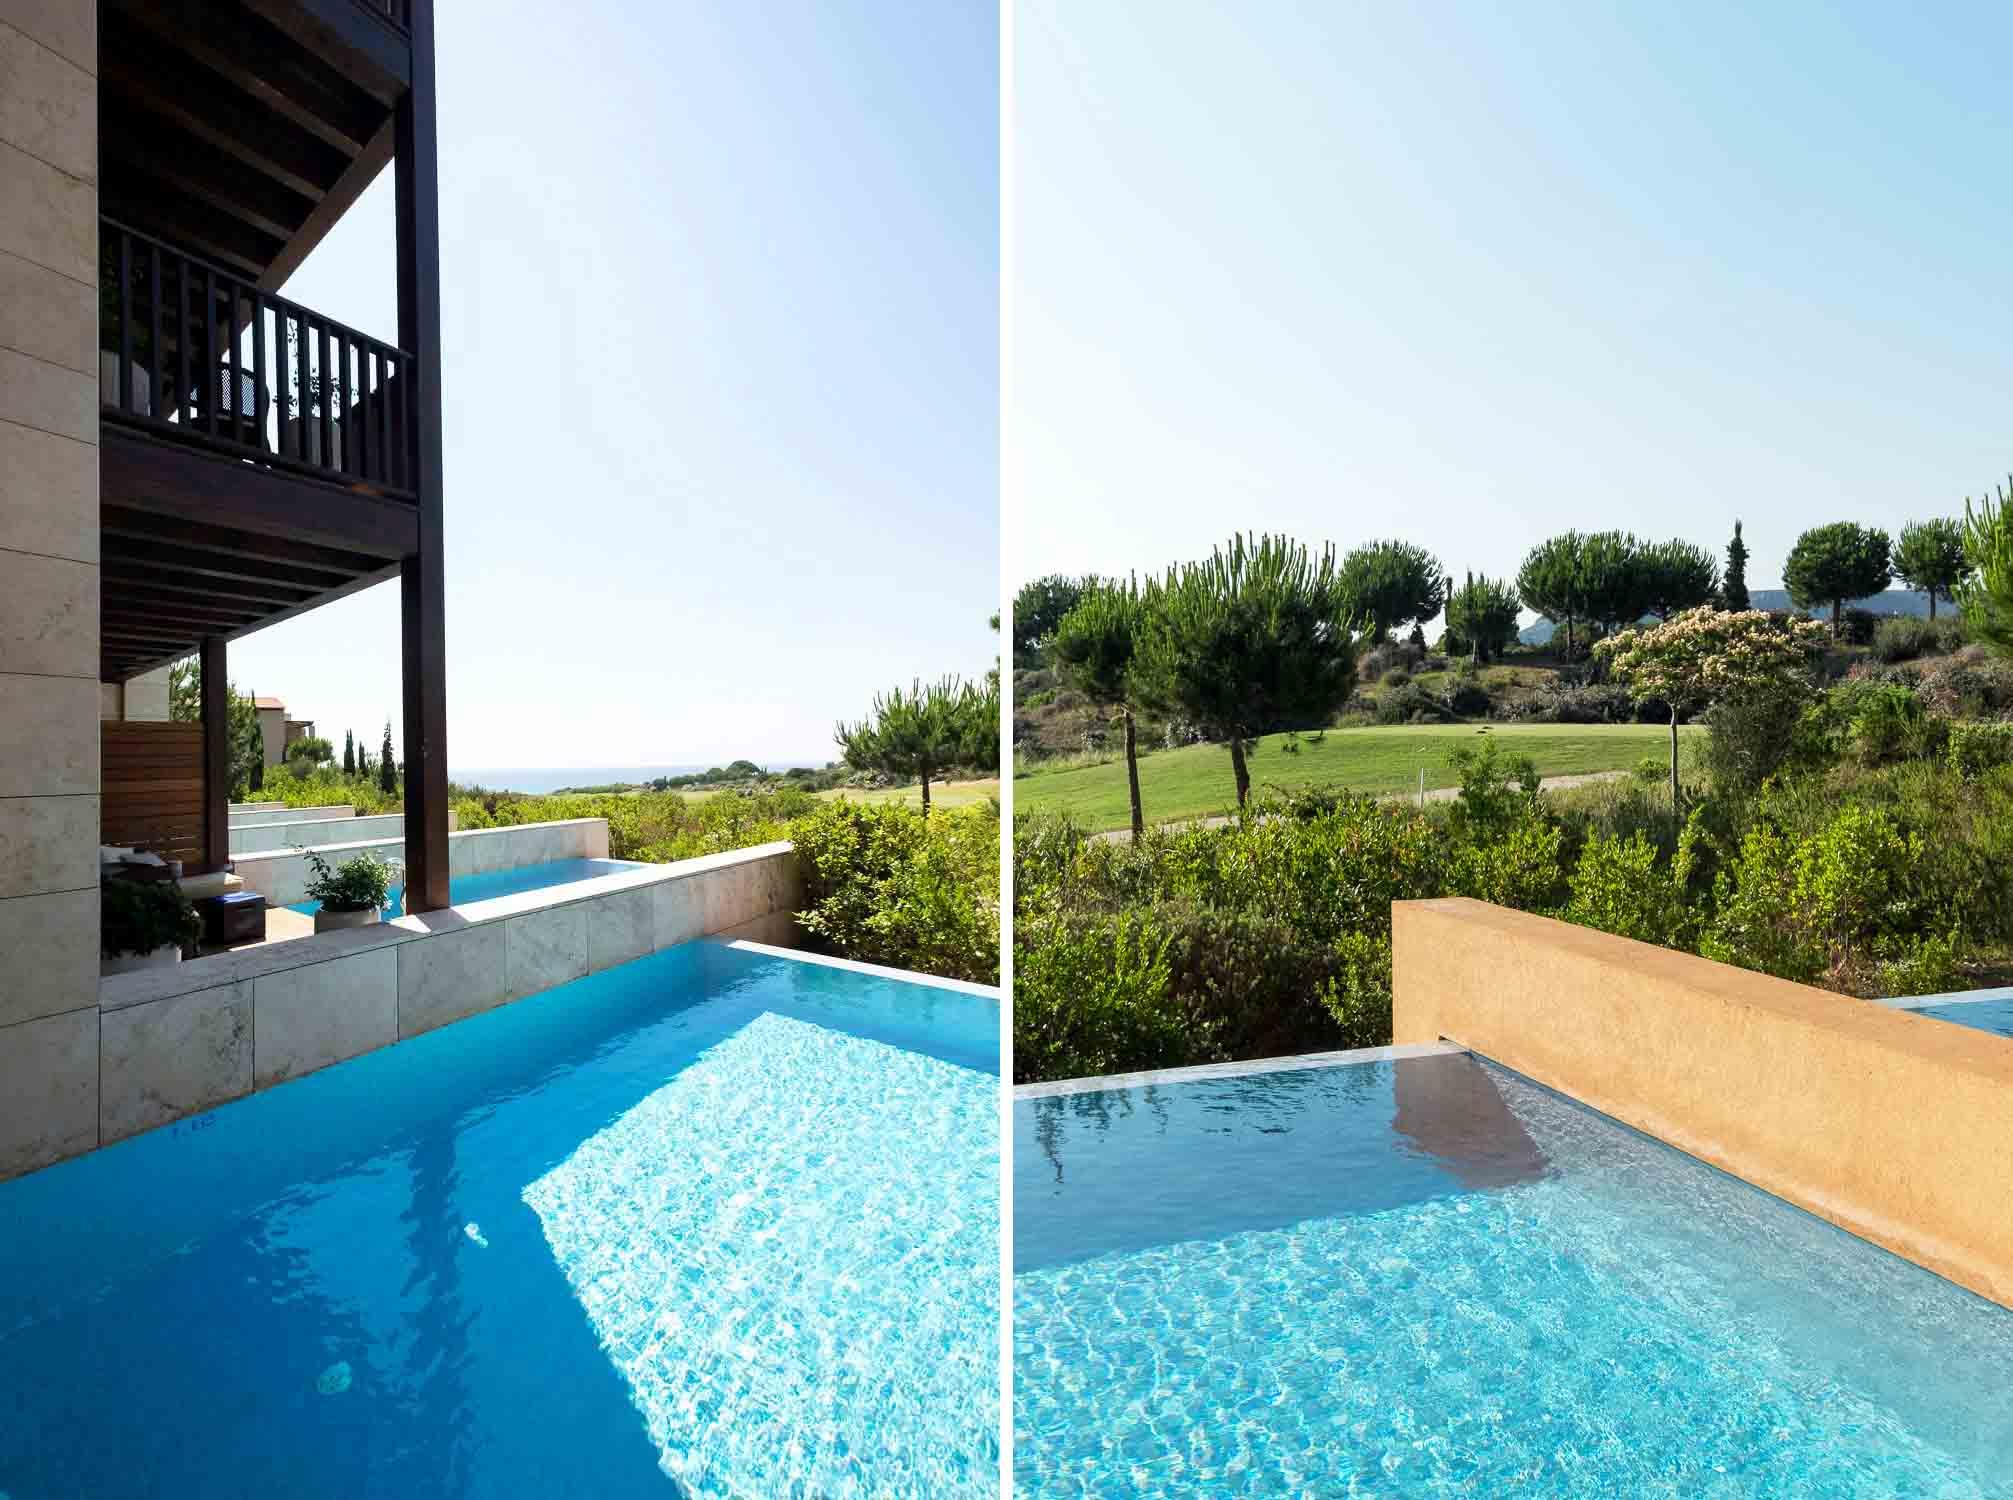 Costa Navarino Resort: A Luxury Holiday Destination in Greece